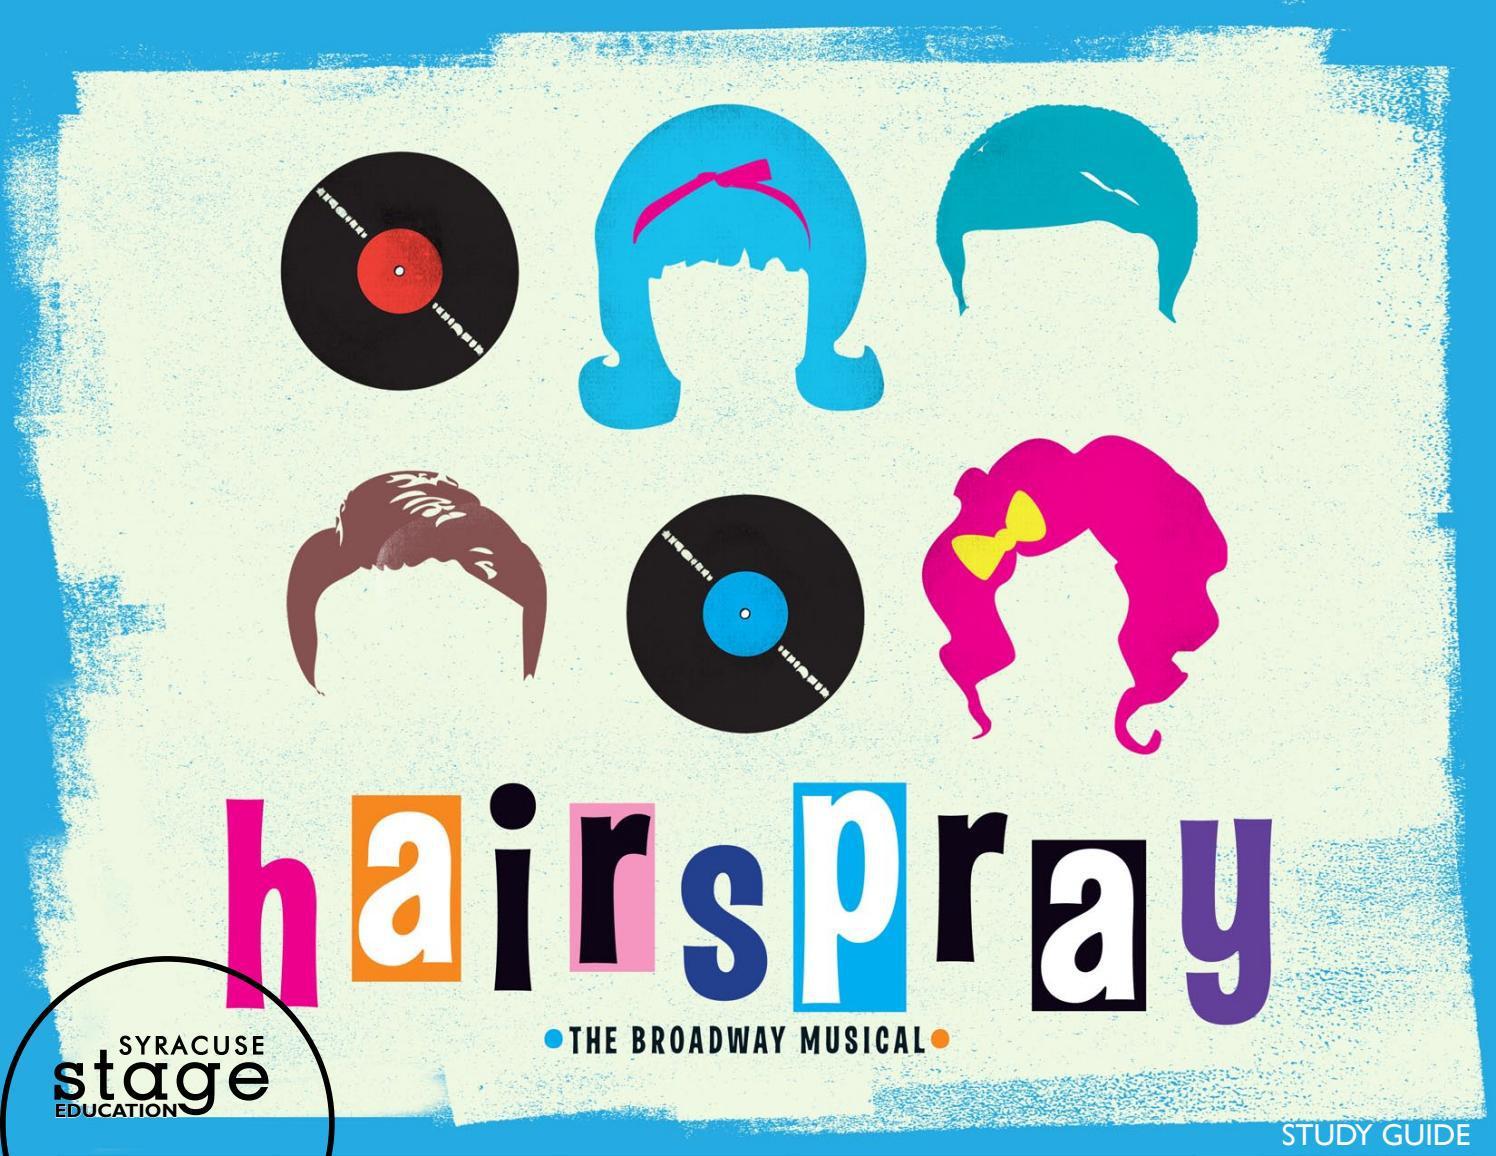 Clutch Ultra hairspray logo